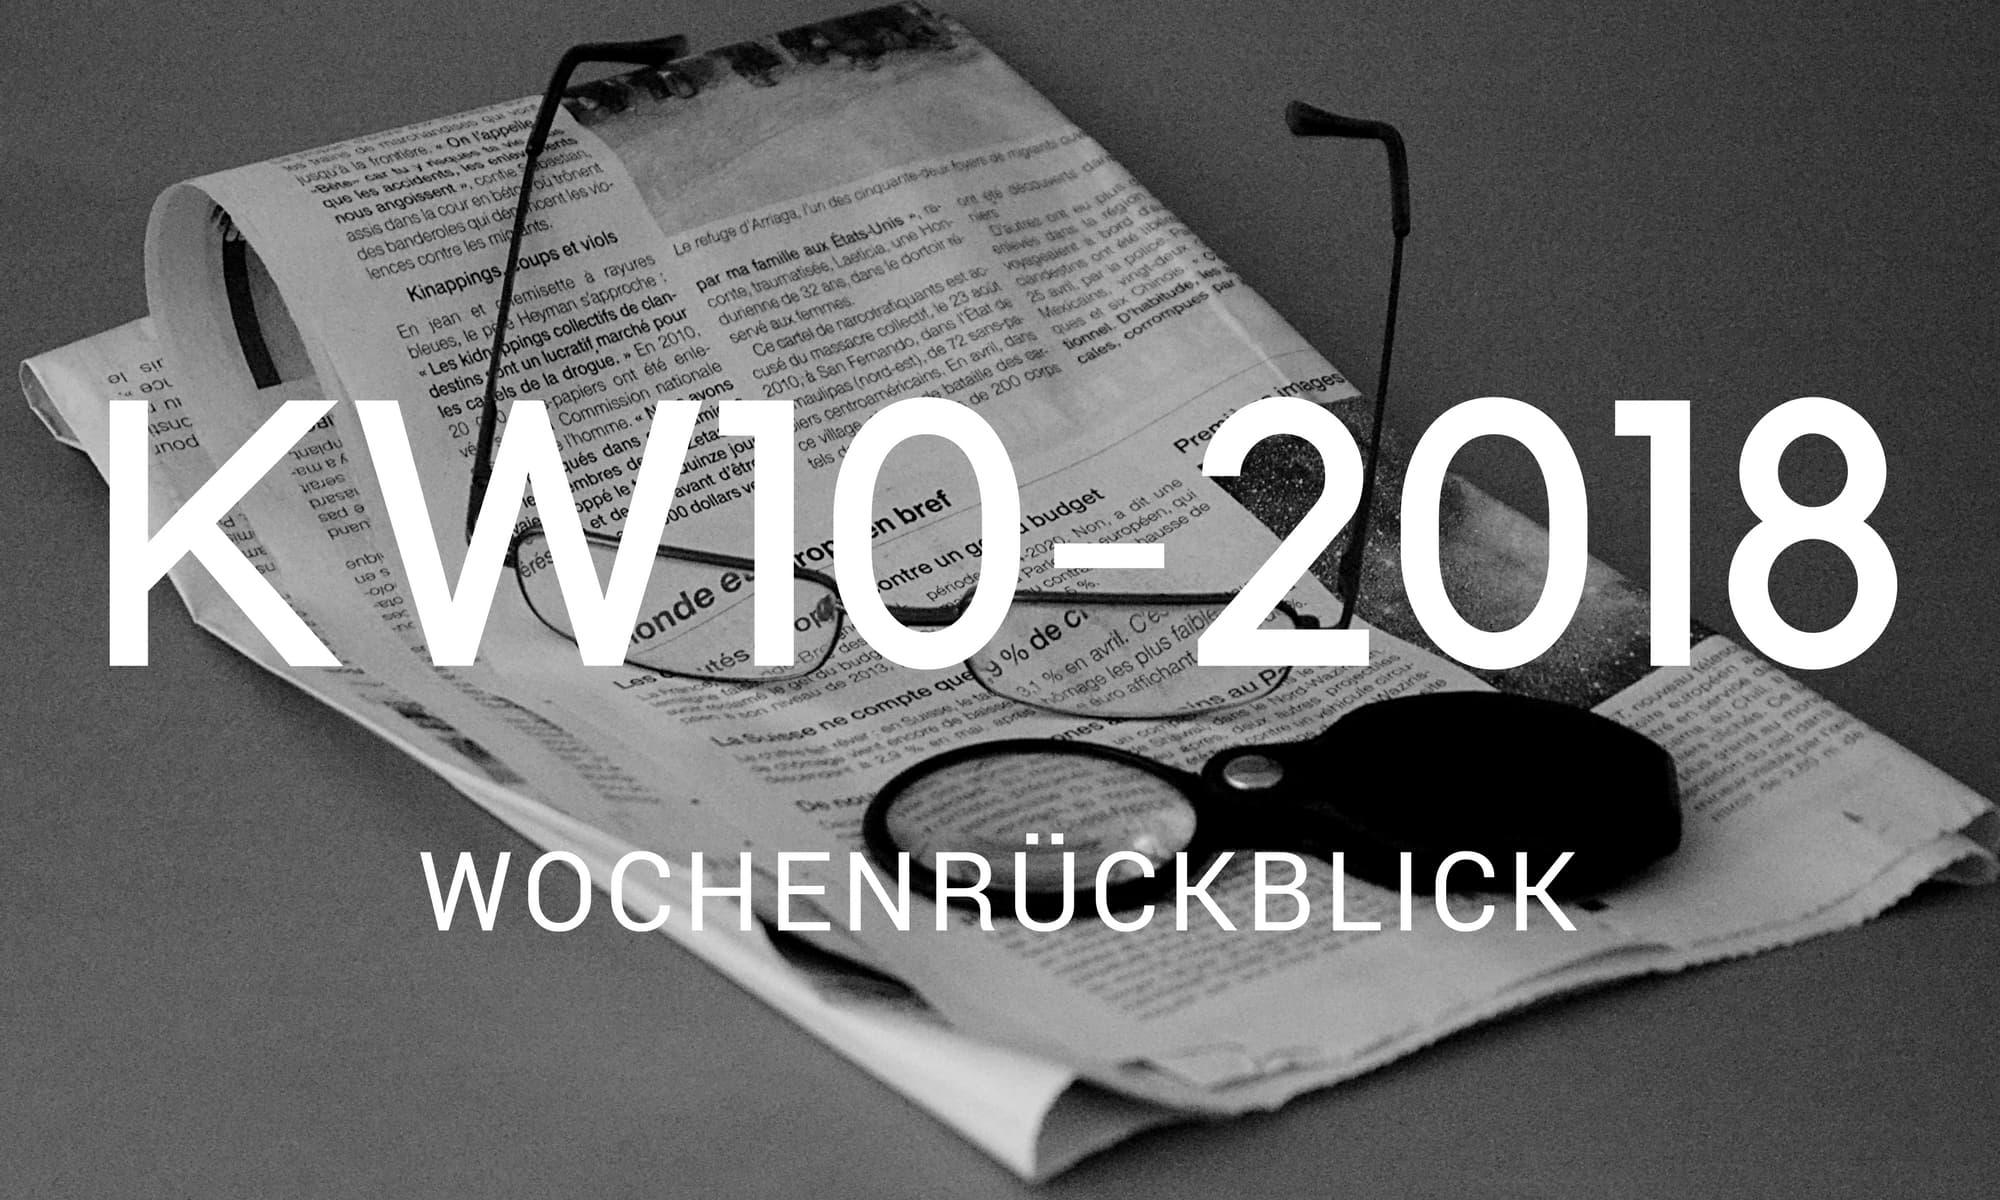 wochenrueckblick camping news KW10-2018